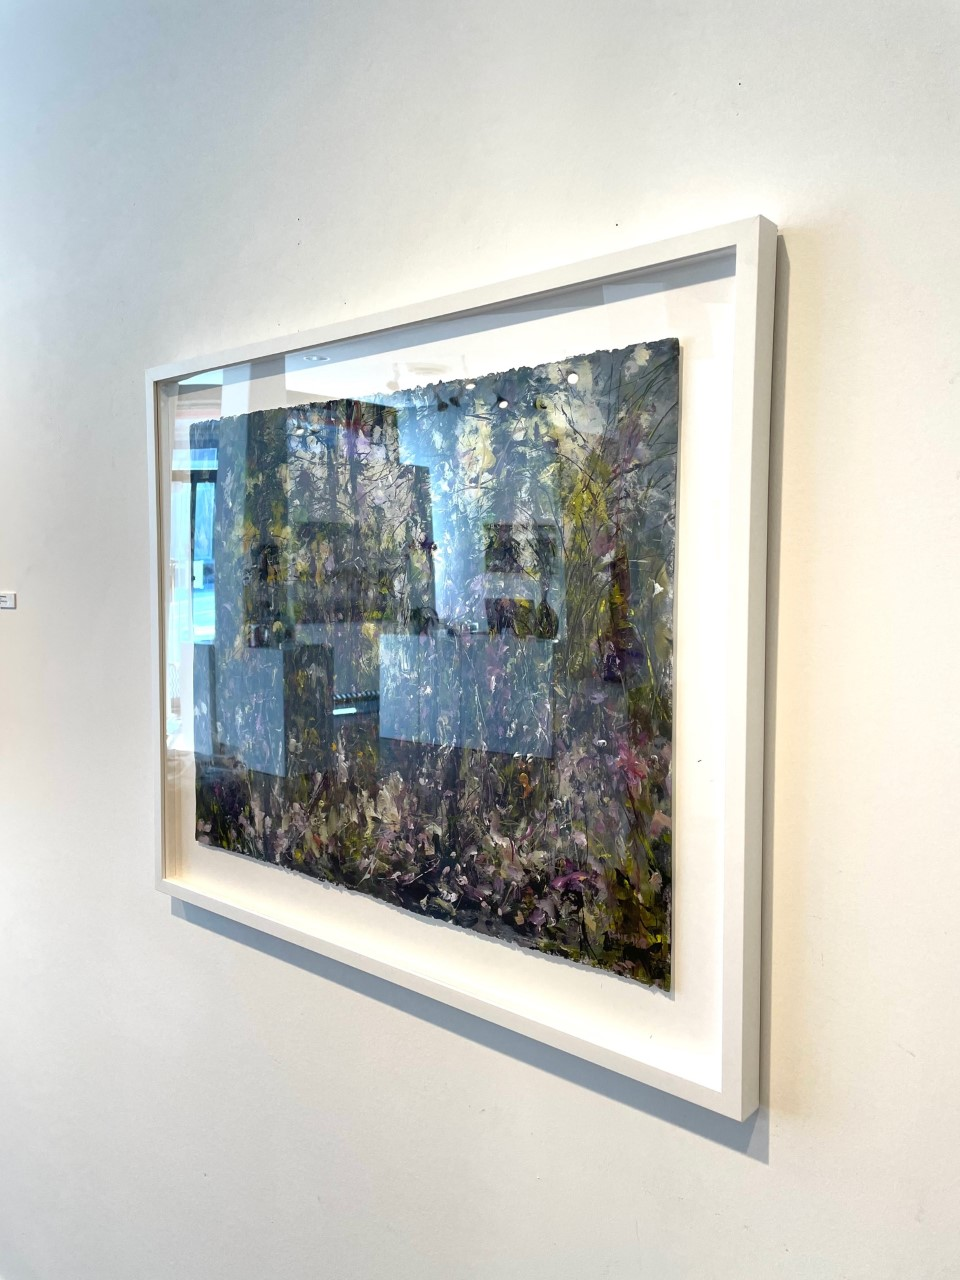 Judy-Cheng-Summer-2010-Acrylic-On-Paper-23x30-Framed-3600-Online-Art-Galleries-side